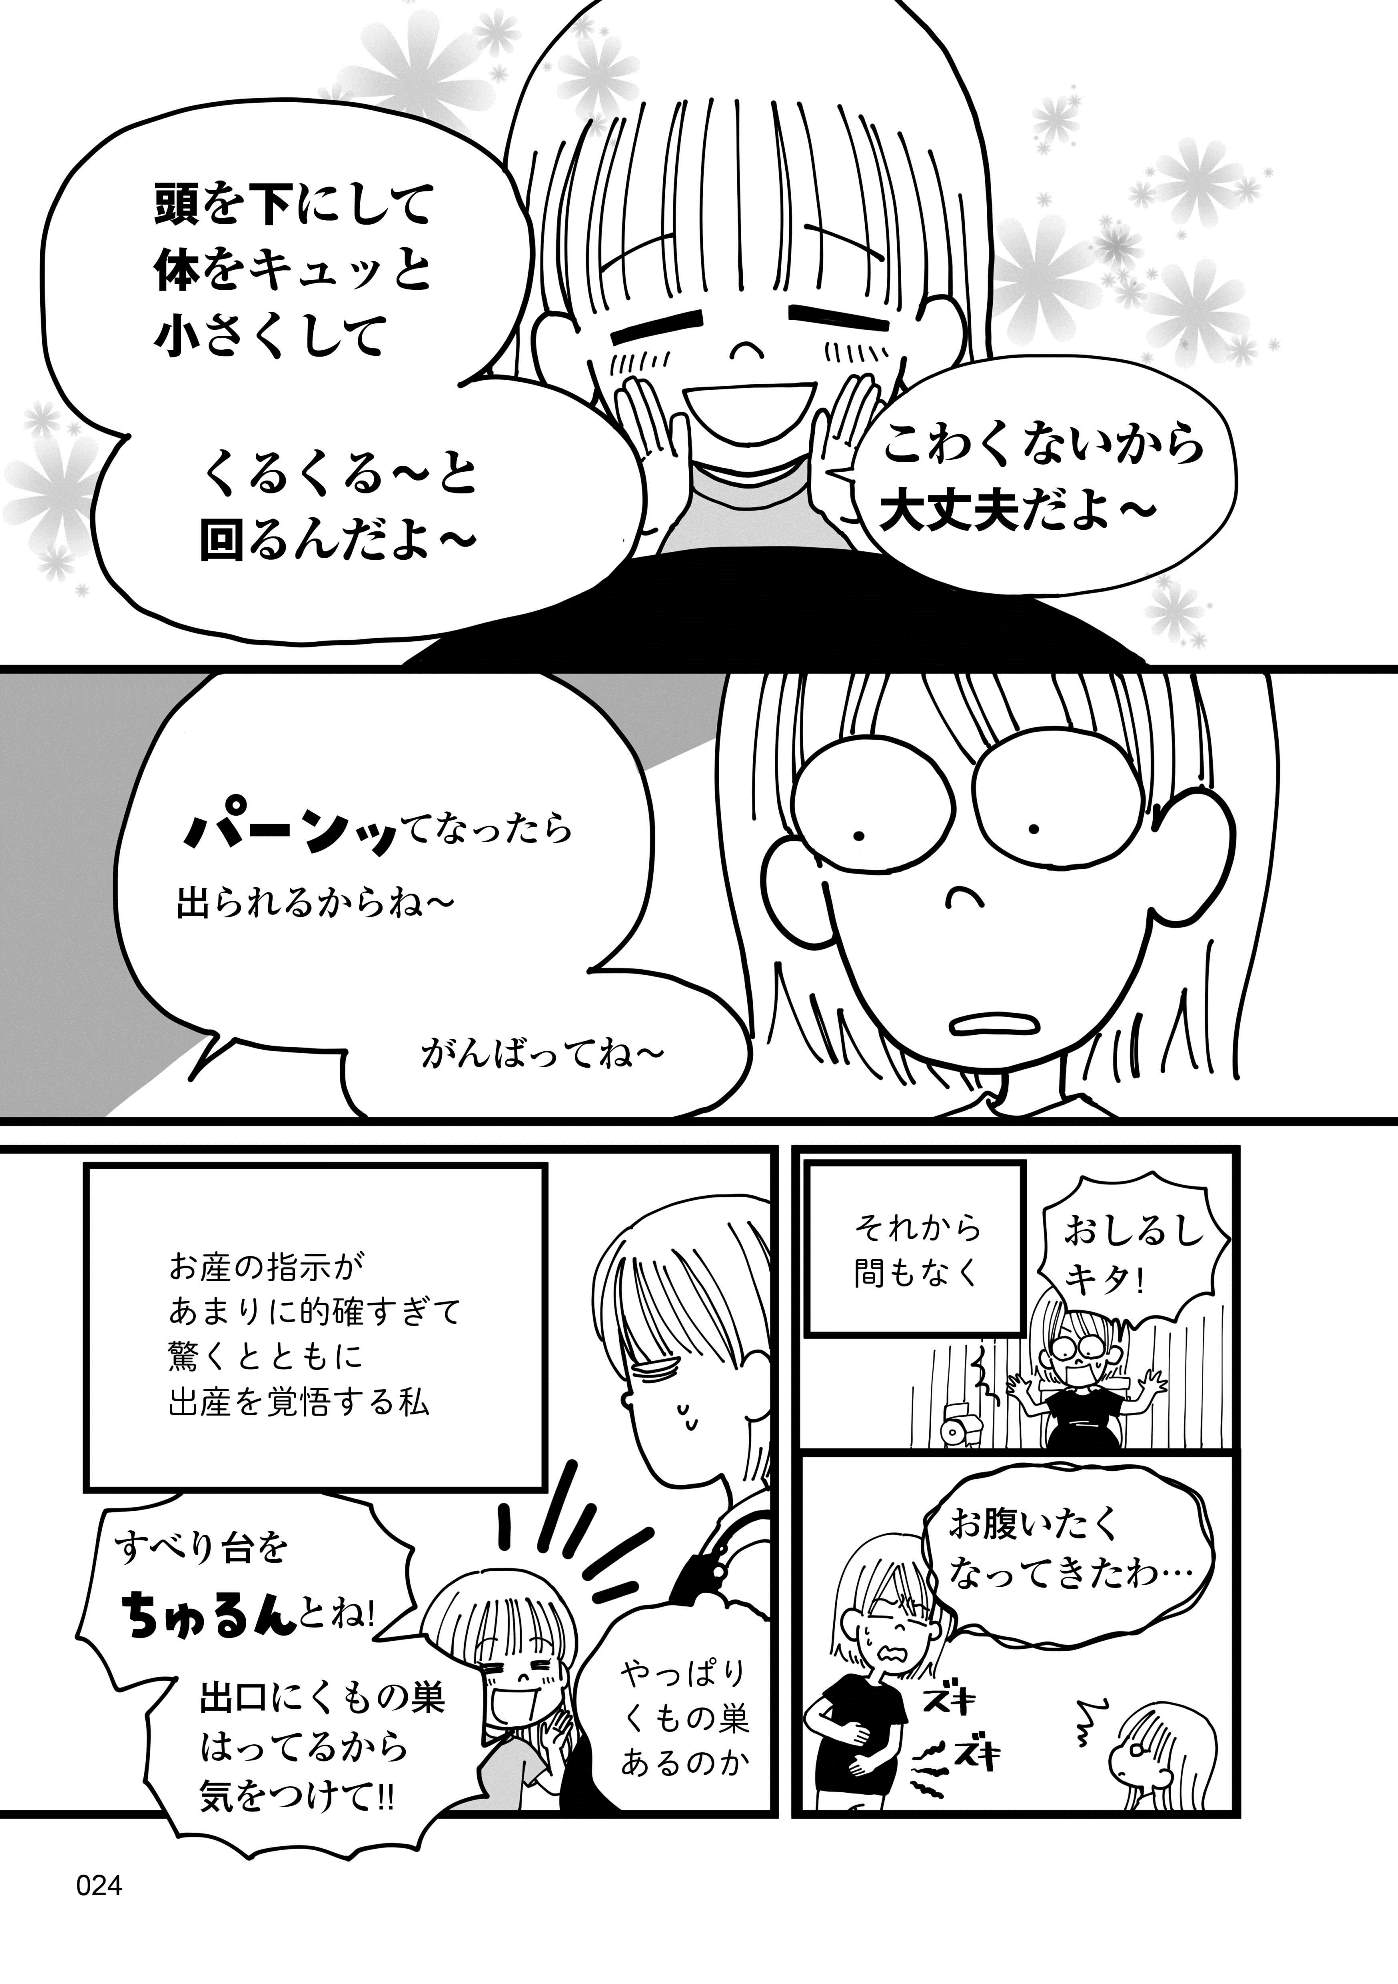 20200720osoranohanashi_sub4.jpg